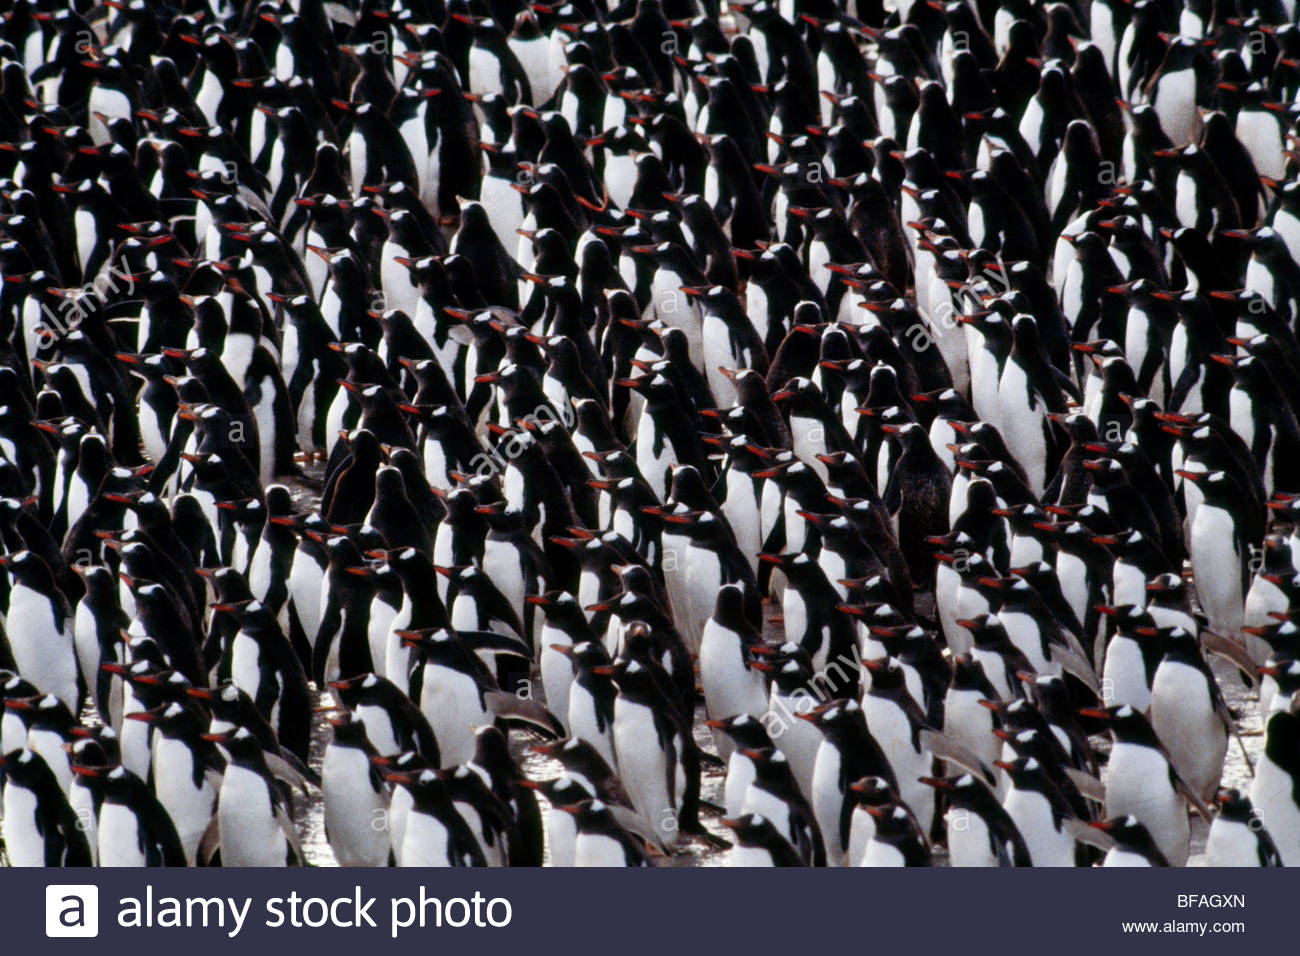 Gentoo penguins on beach, Pygoscelis papua, Falkland Islands - Stock Image